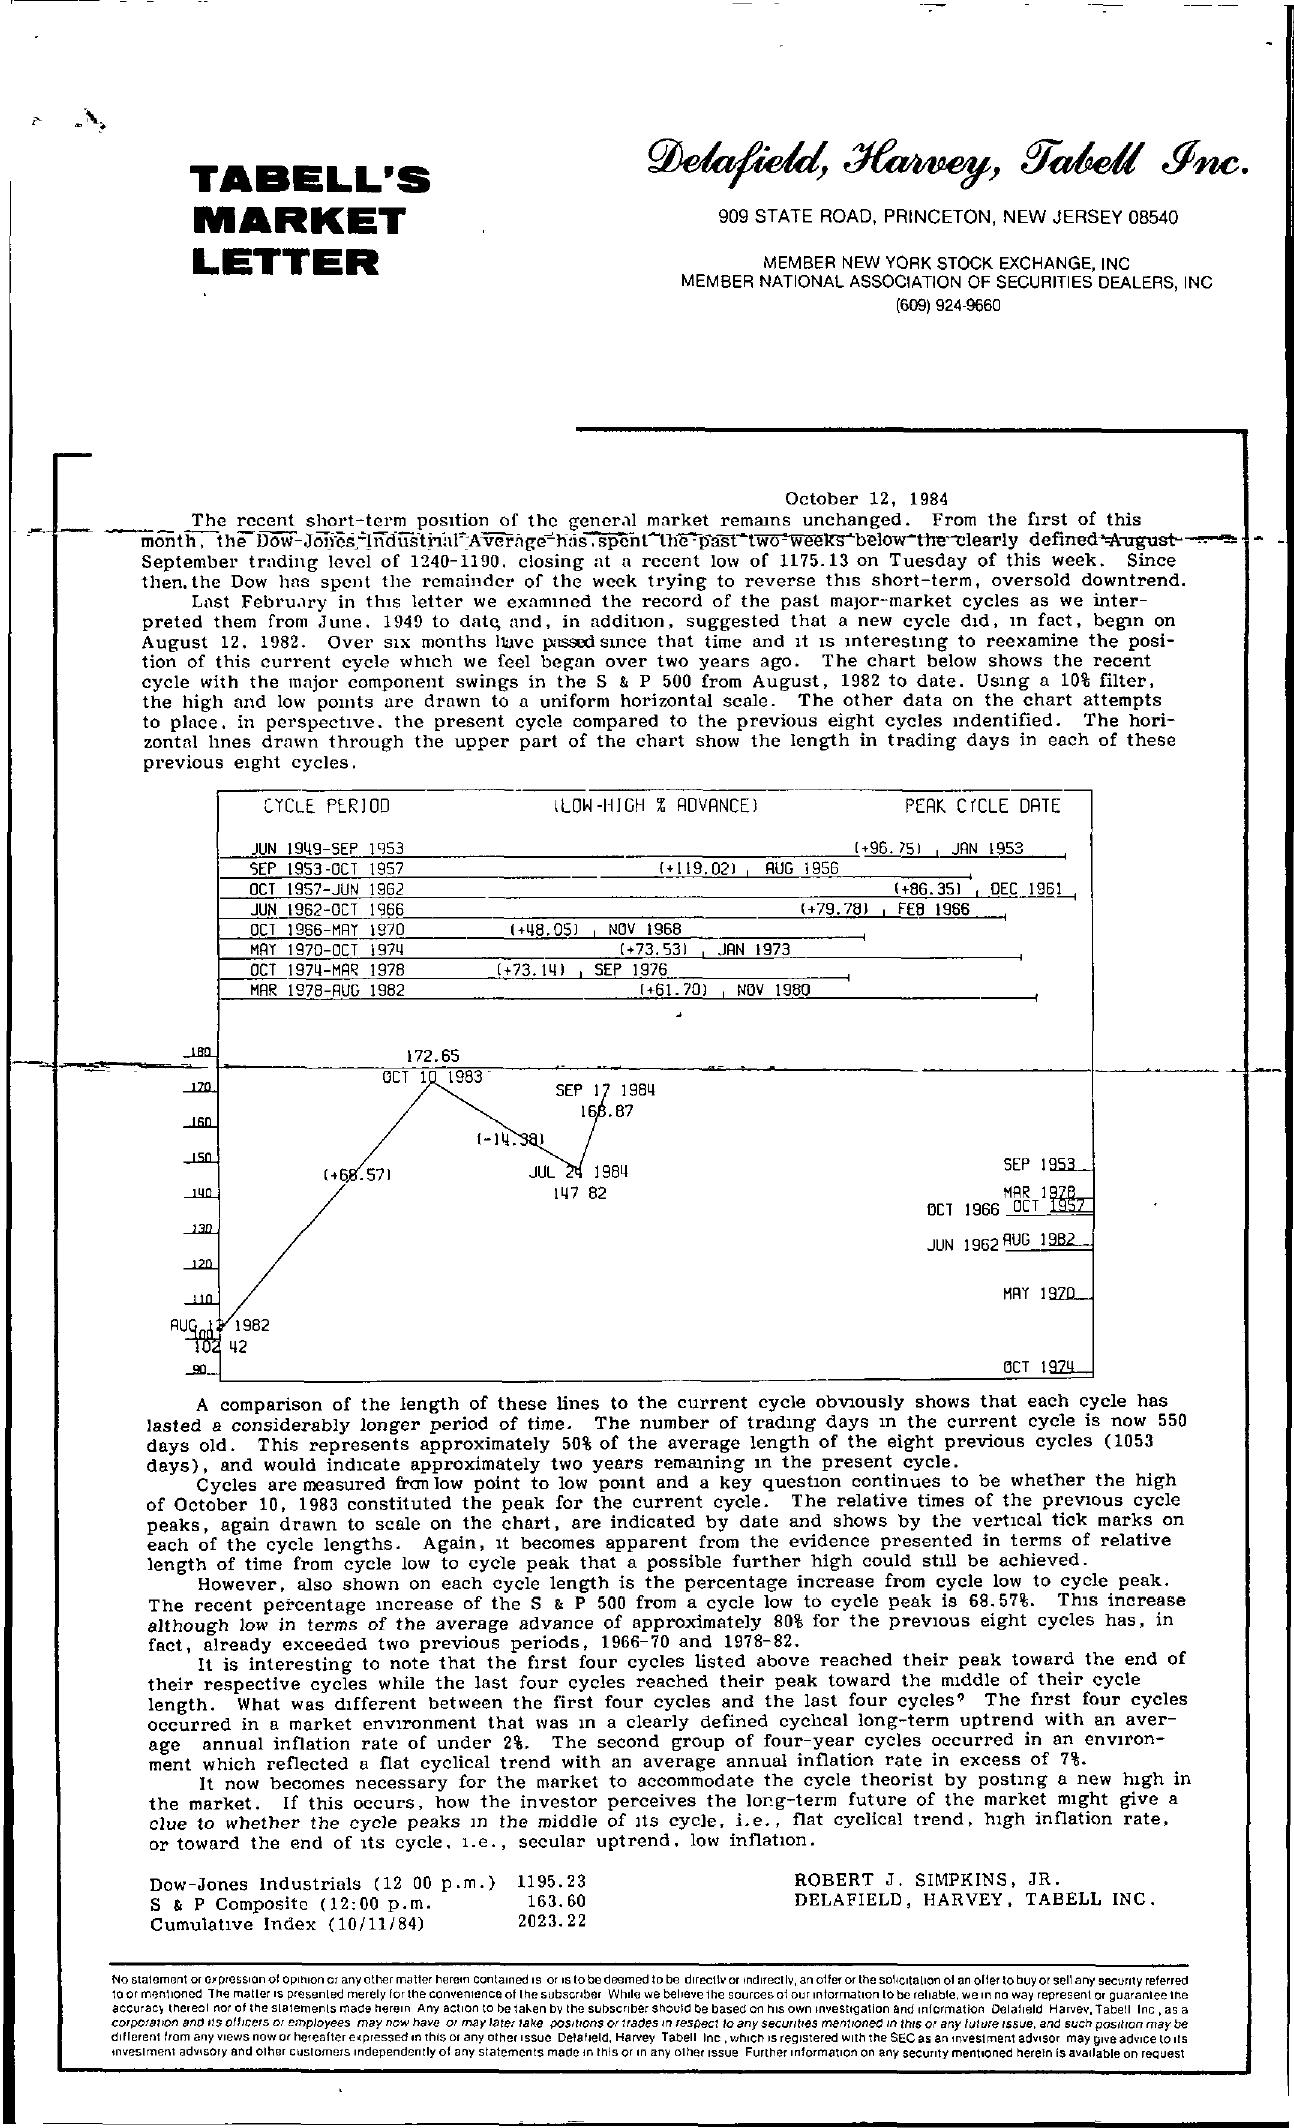 Tabell's Market Letter - October 12, 1984